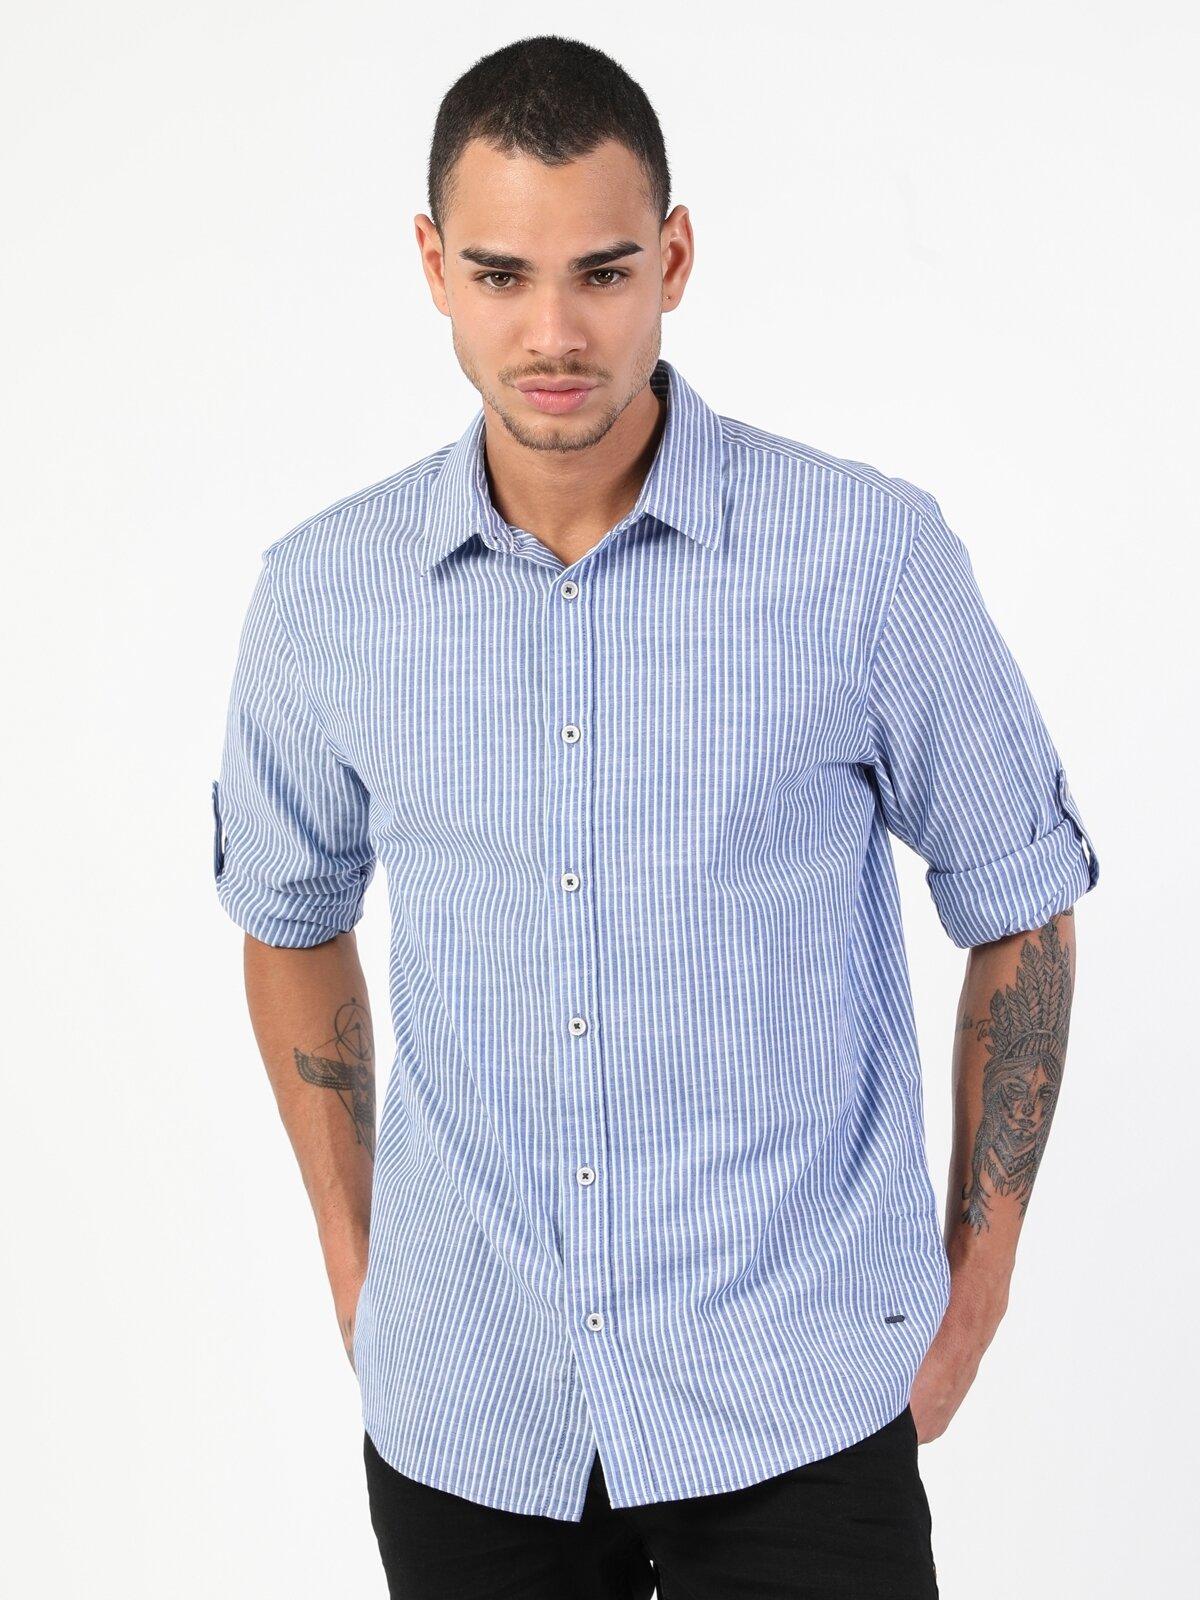 Regular Fit Standart Kol V Yaka Mavi Erkek Gömlek Uzun Kol